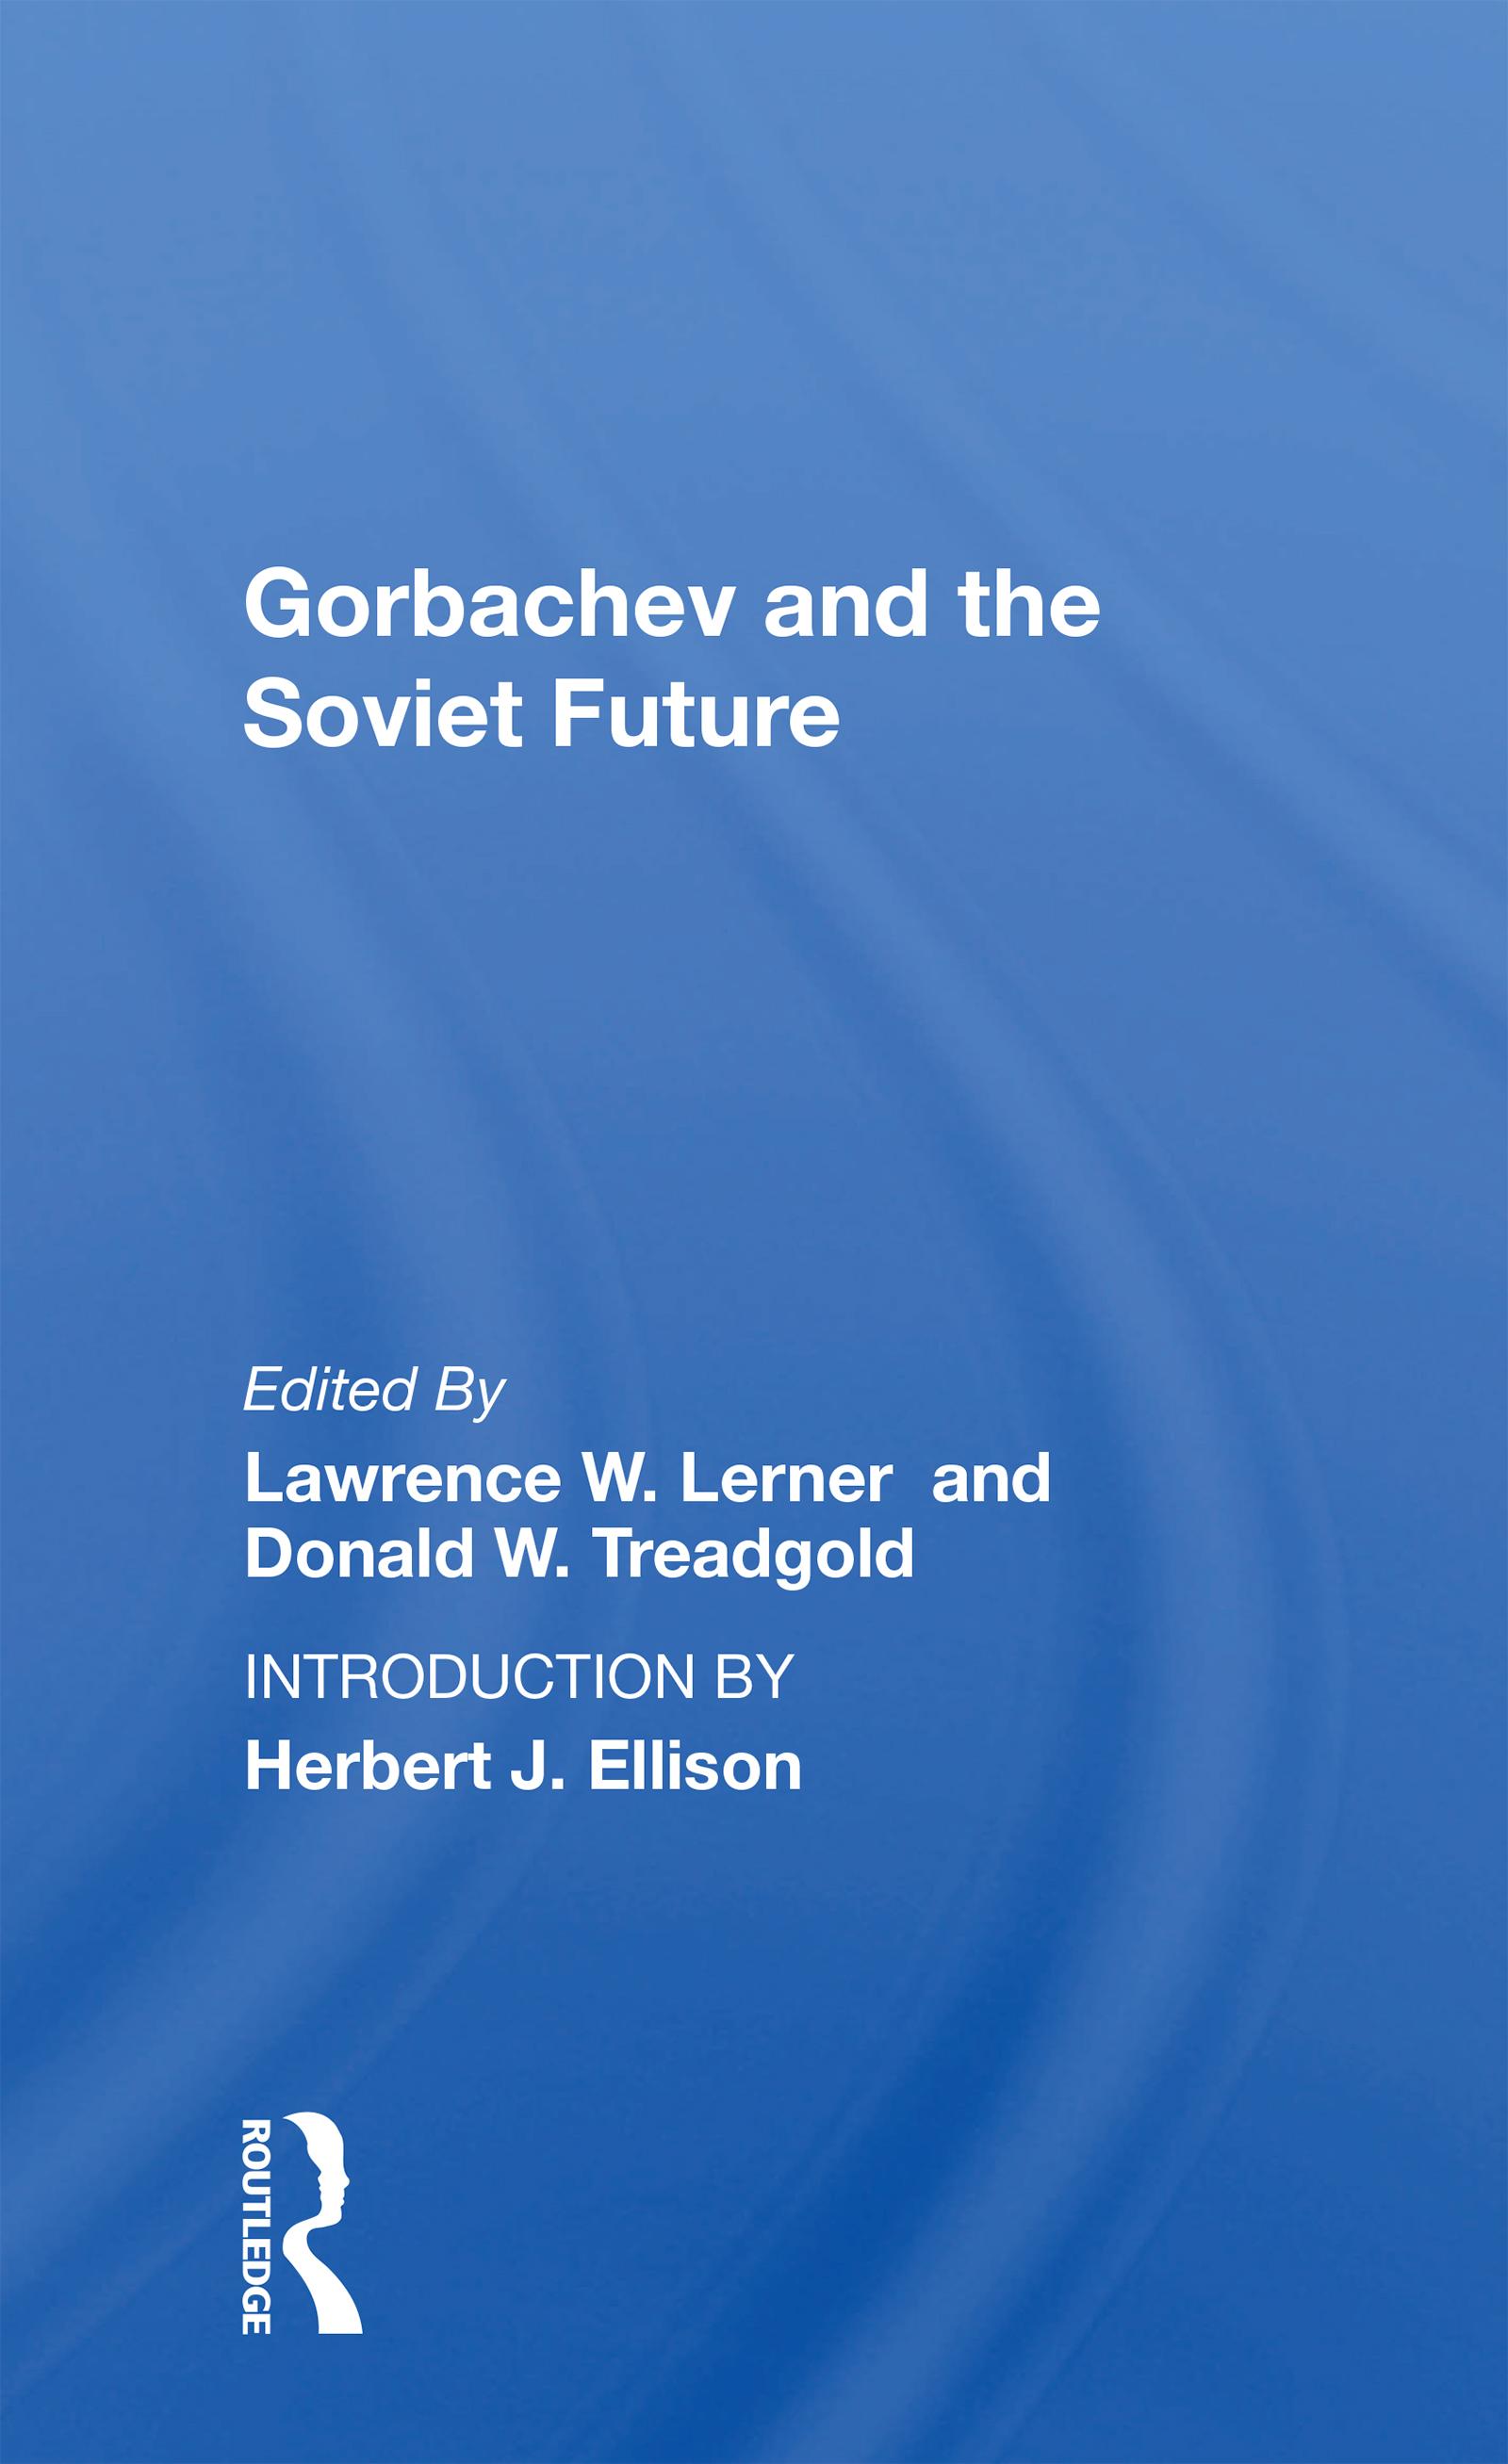 Gorbachev and the Soviet Future